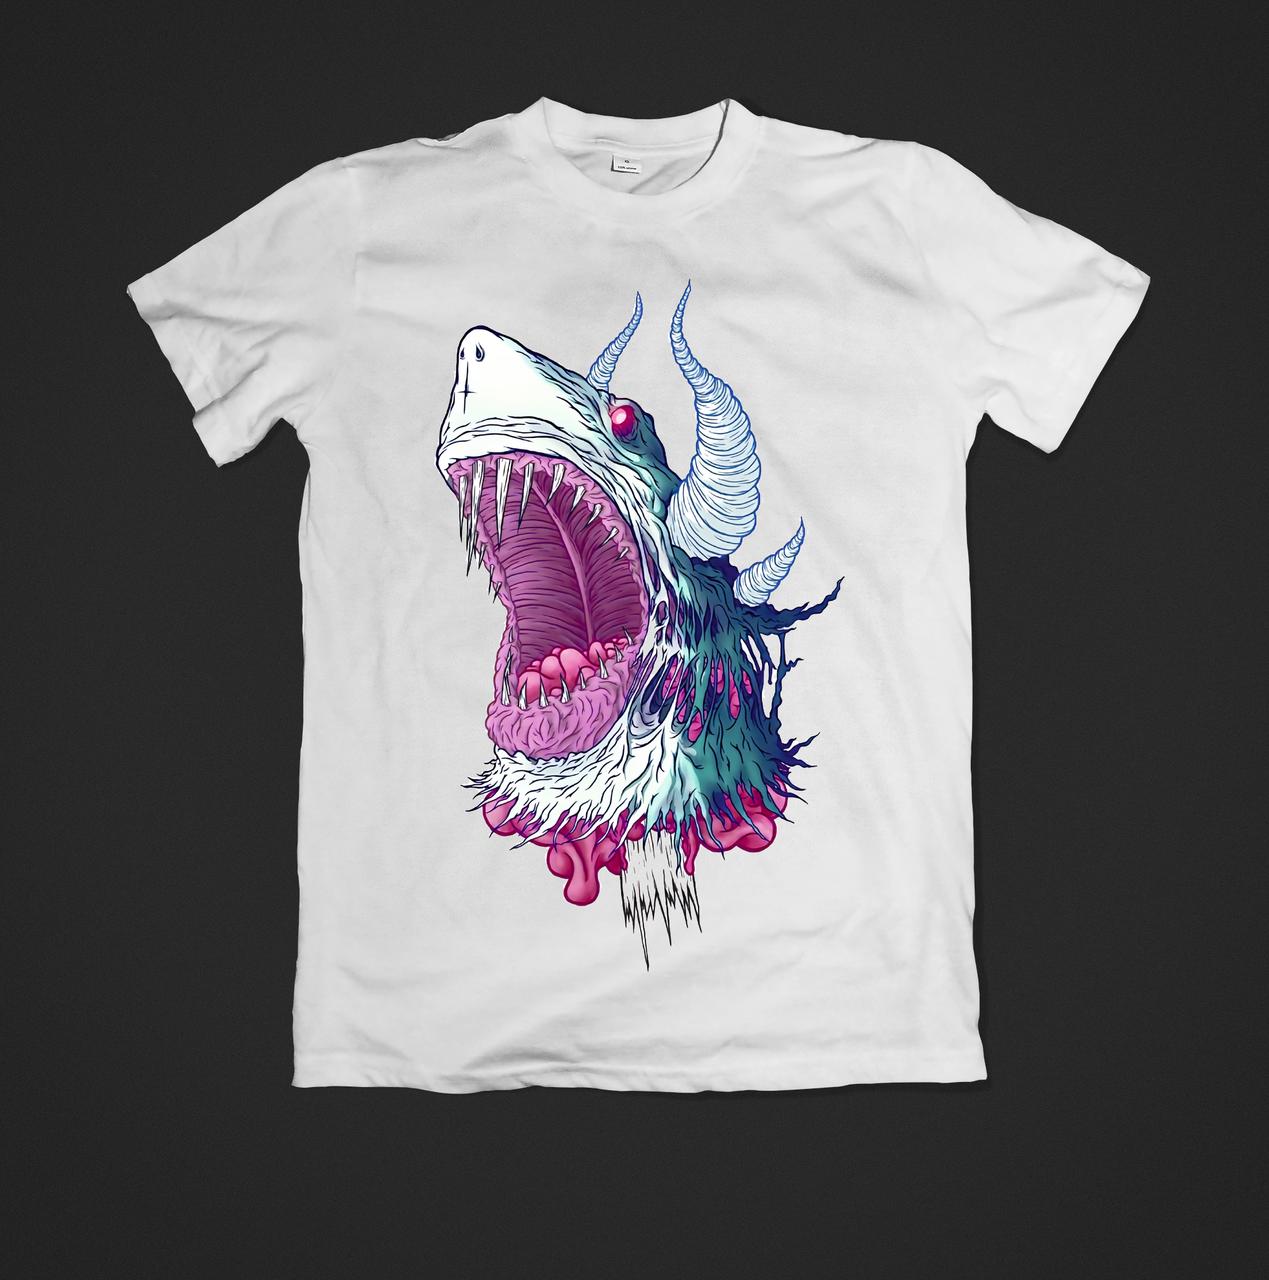 Футболка YOUstyle для мужчин shark  0499 XL White